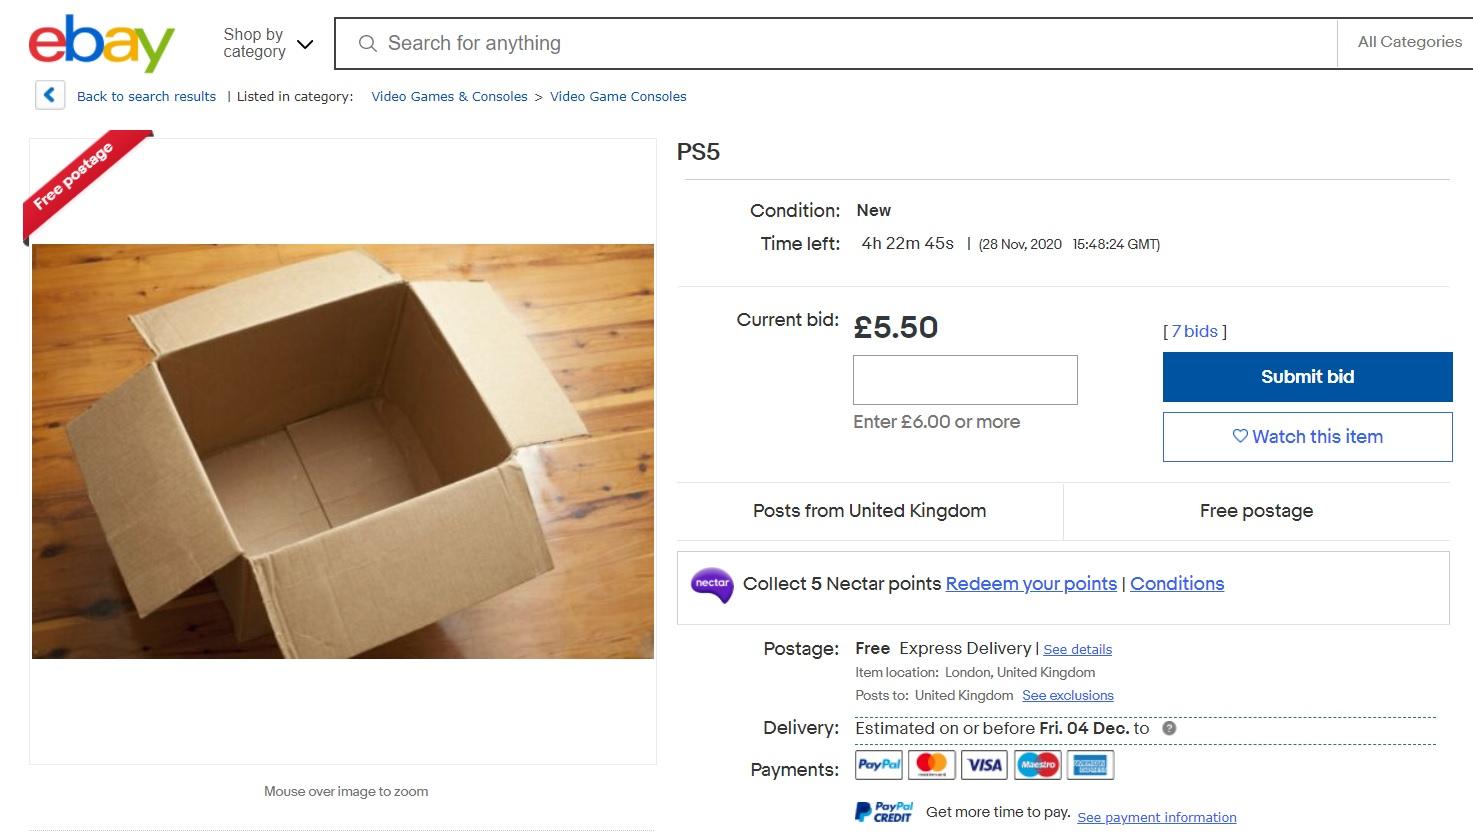 Ebay出现大量贩卖PS5照片的骗子 官方:已开始整治